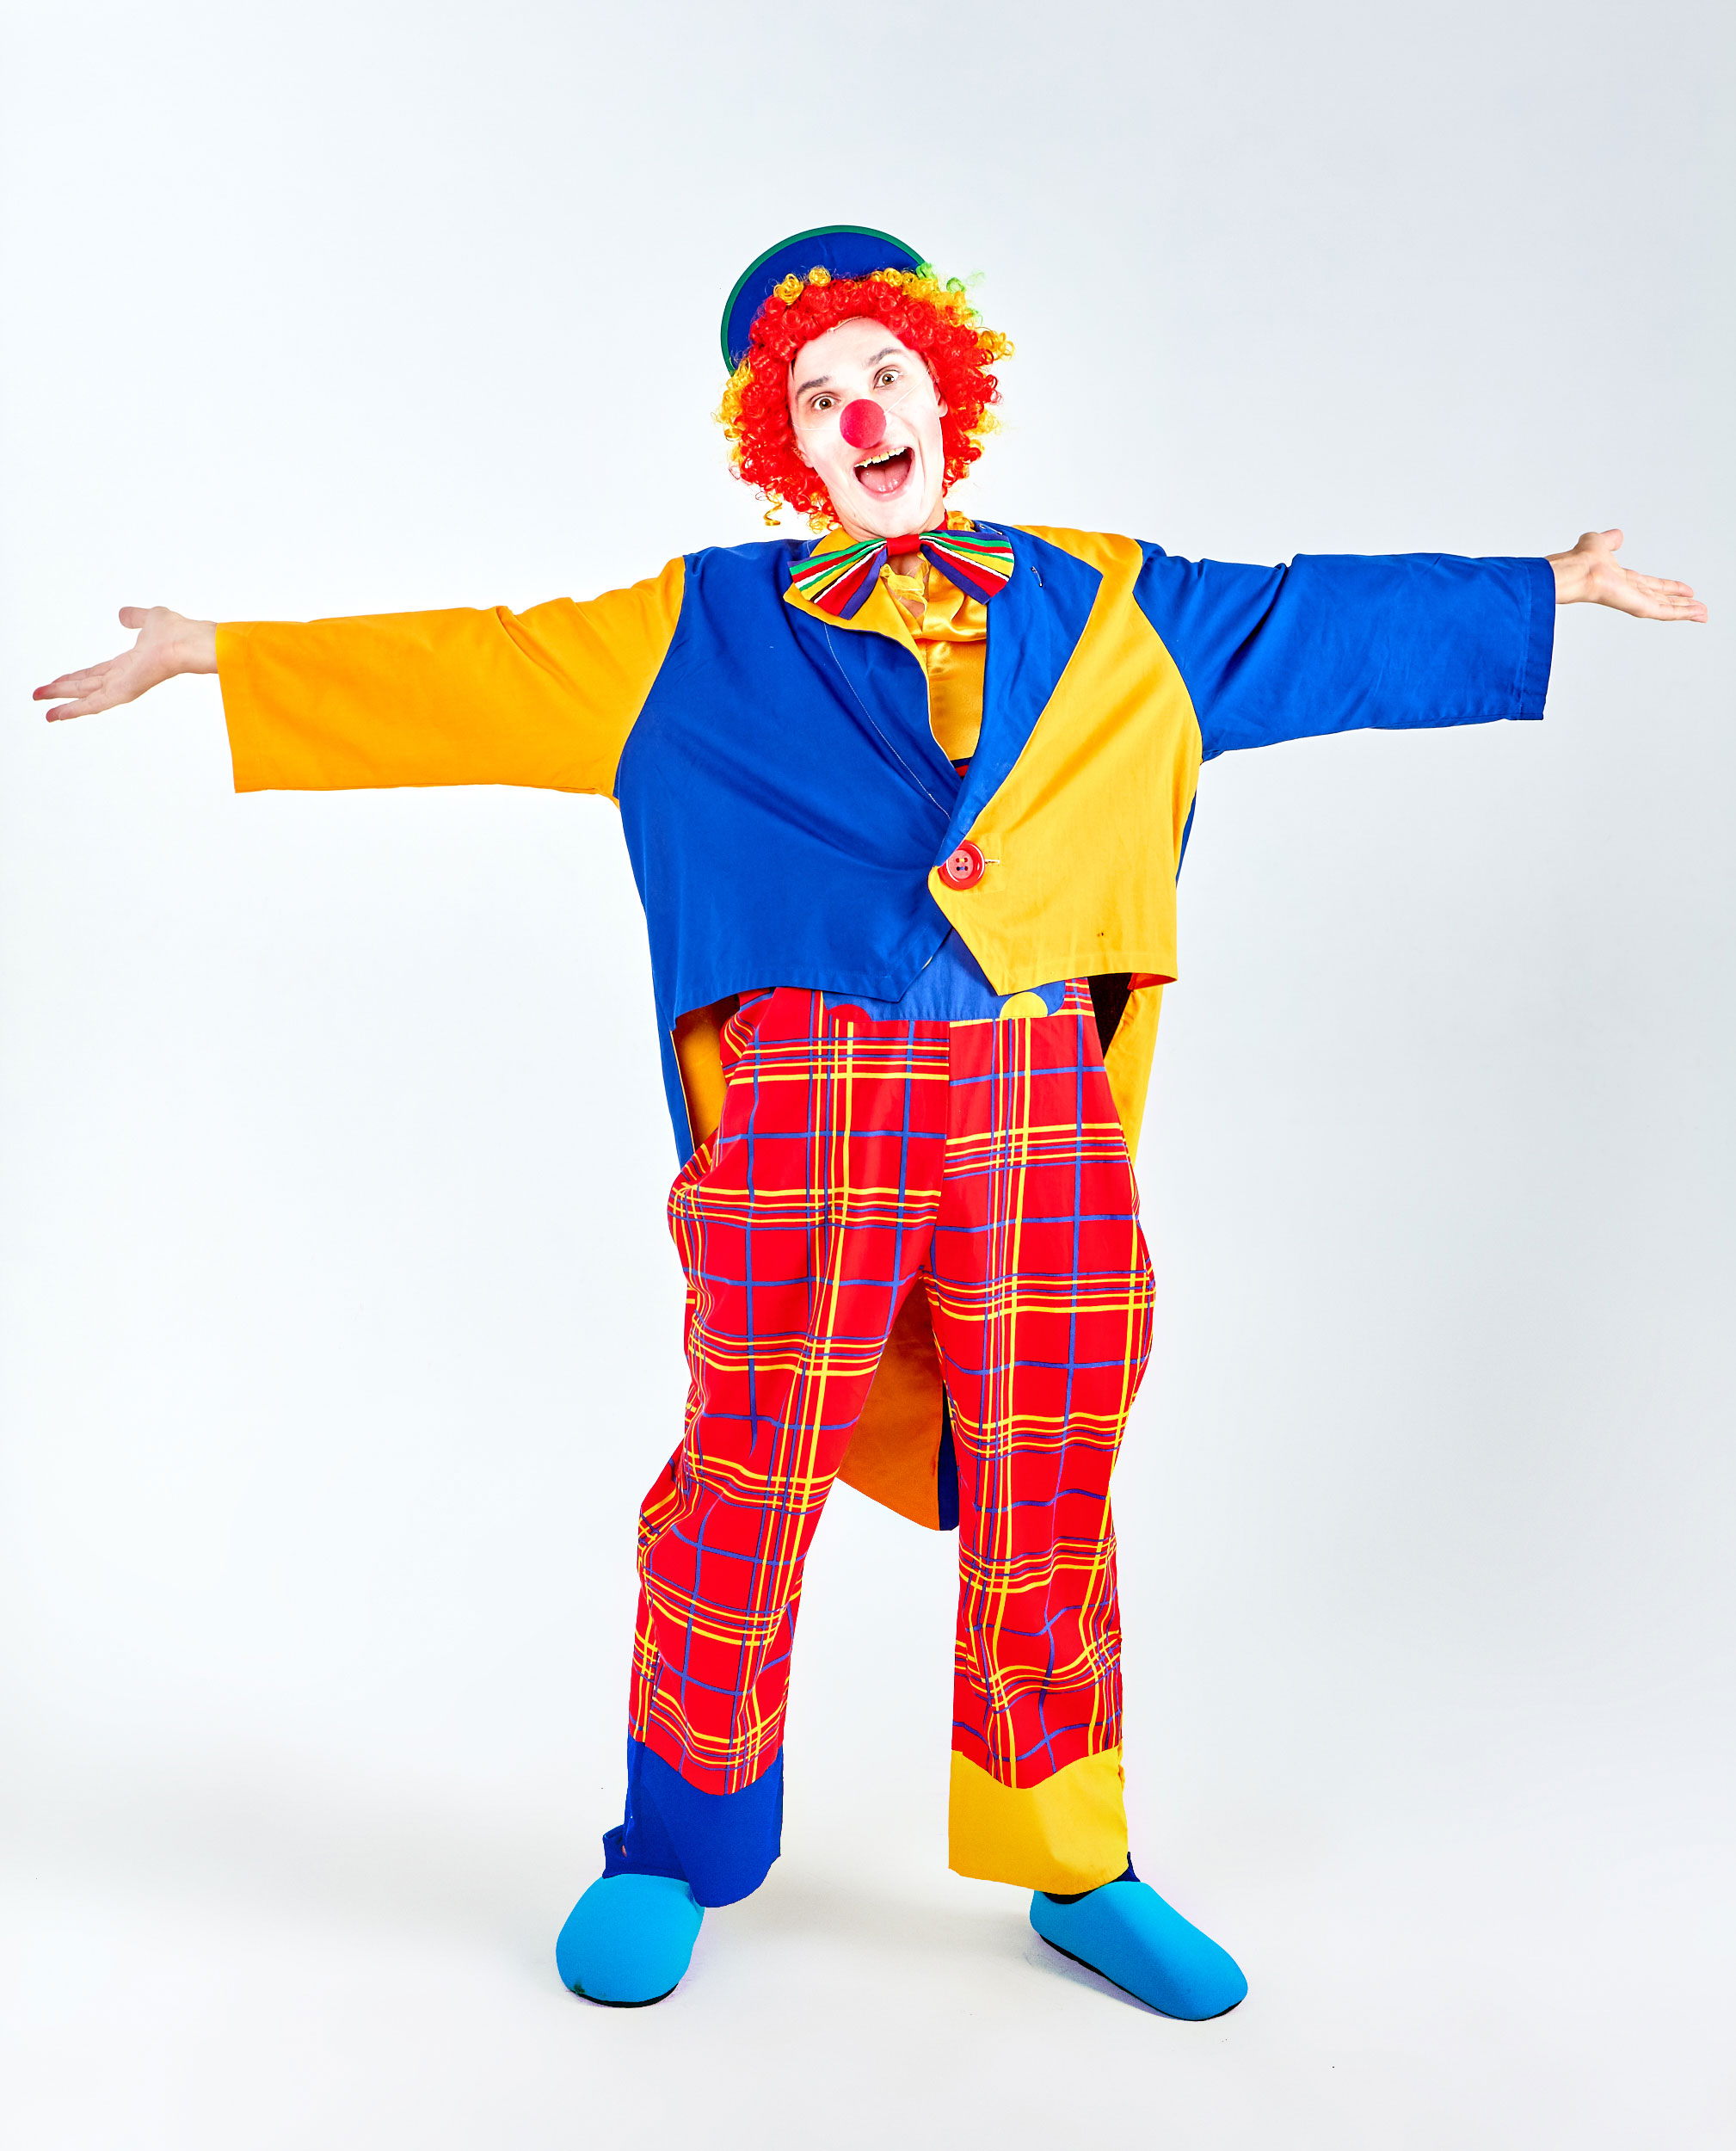 Картинки про клоуна, рыжих котов